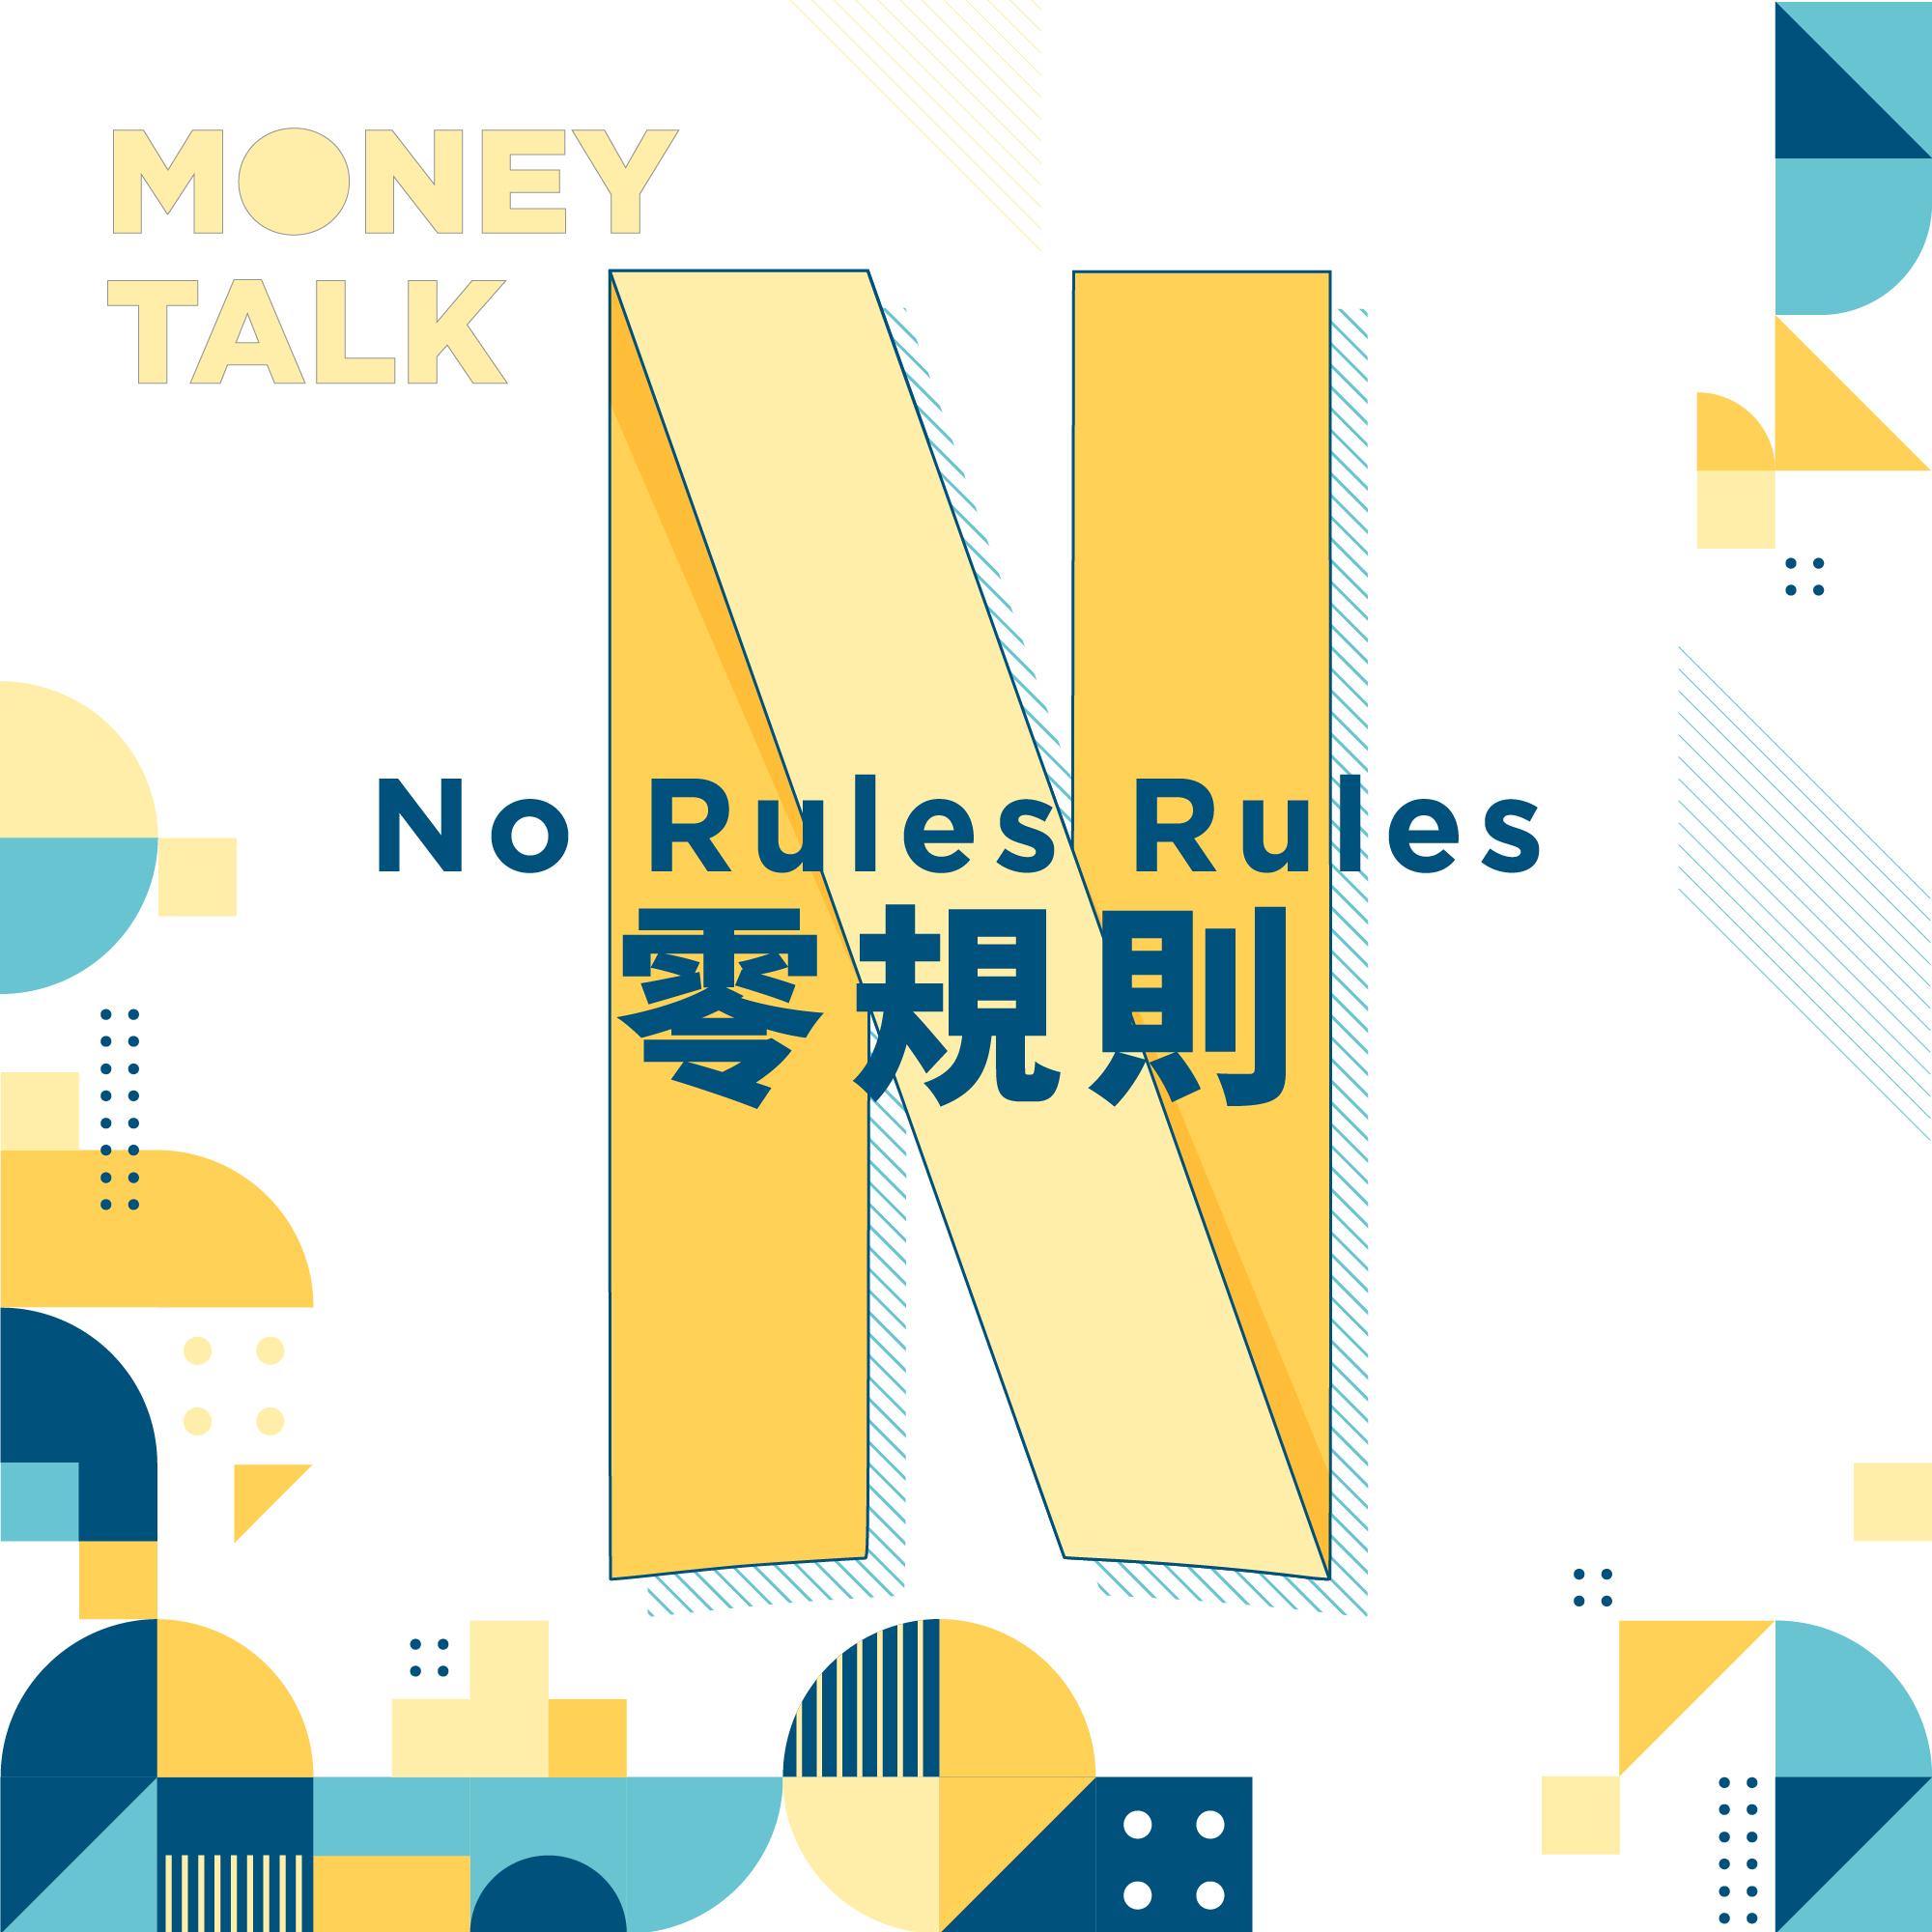 NETFLIX越來越夯,是因為不可思議的管理方法?與CEO鄧耀中對談「零規則」【一起閱讀】